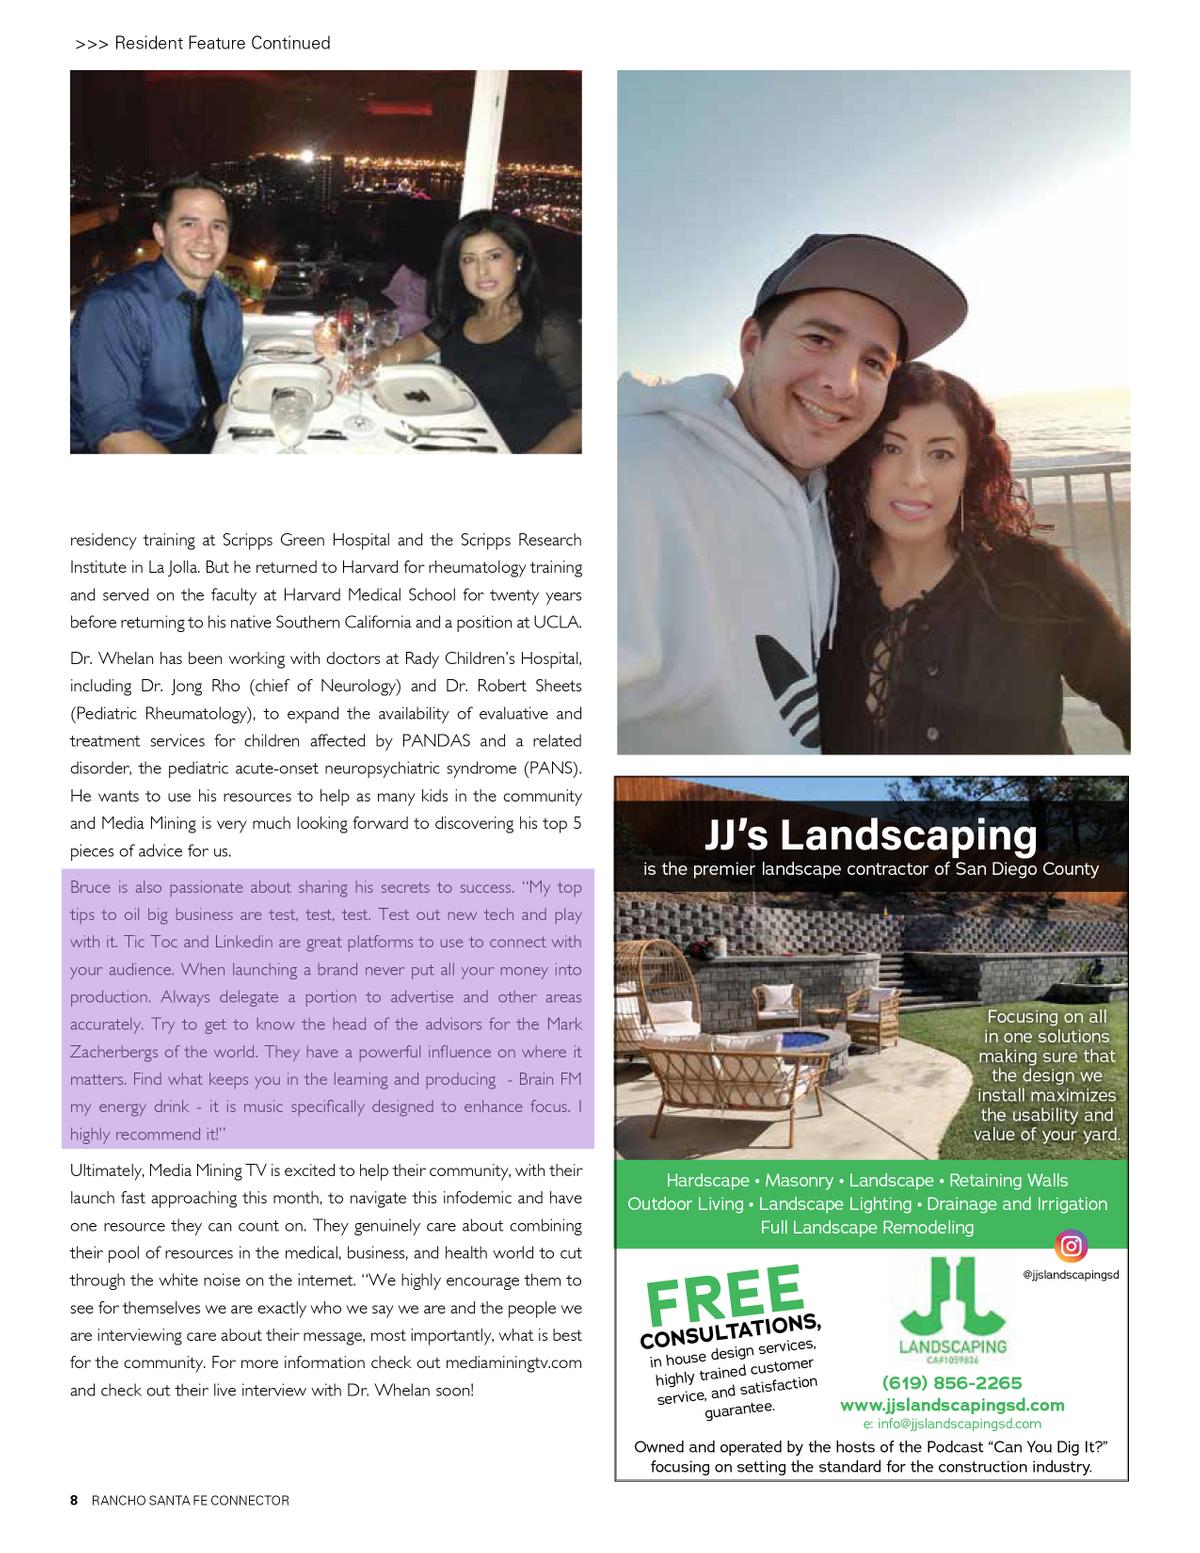 Blog 0035_RSFConnector_June2020-8 copy.jpg